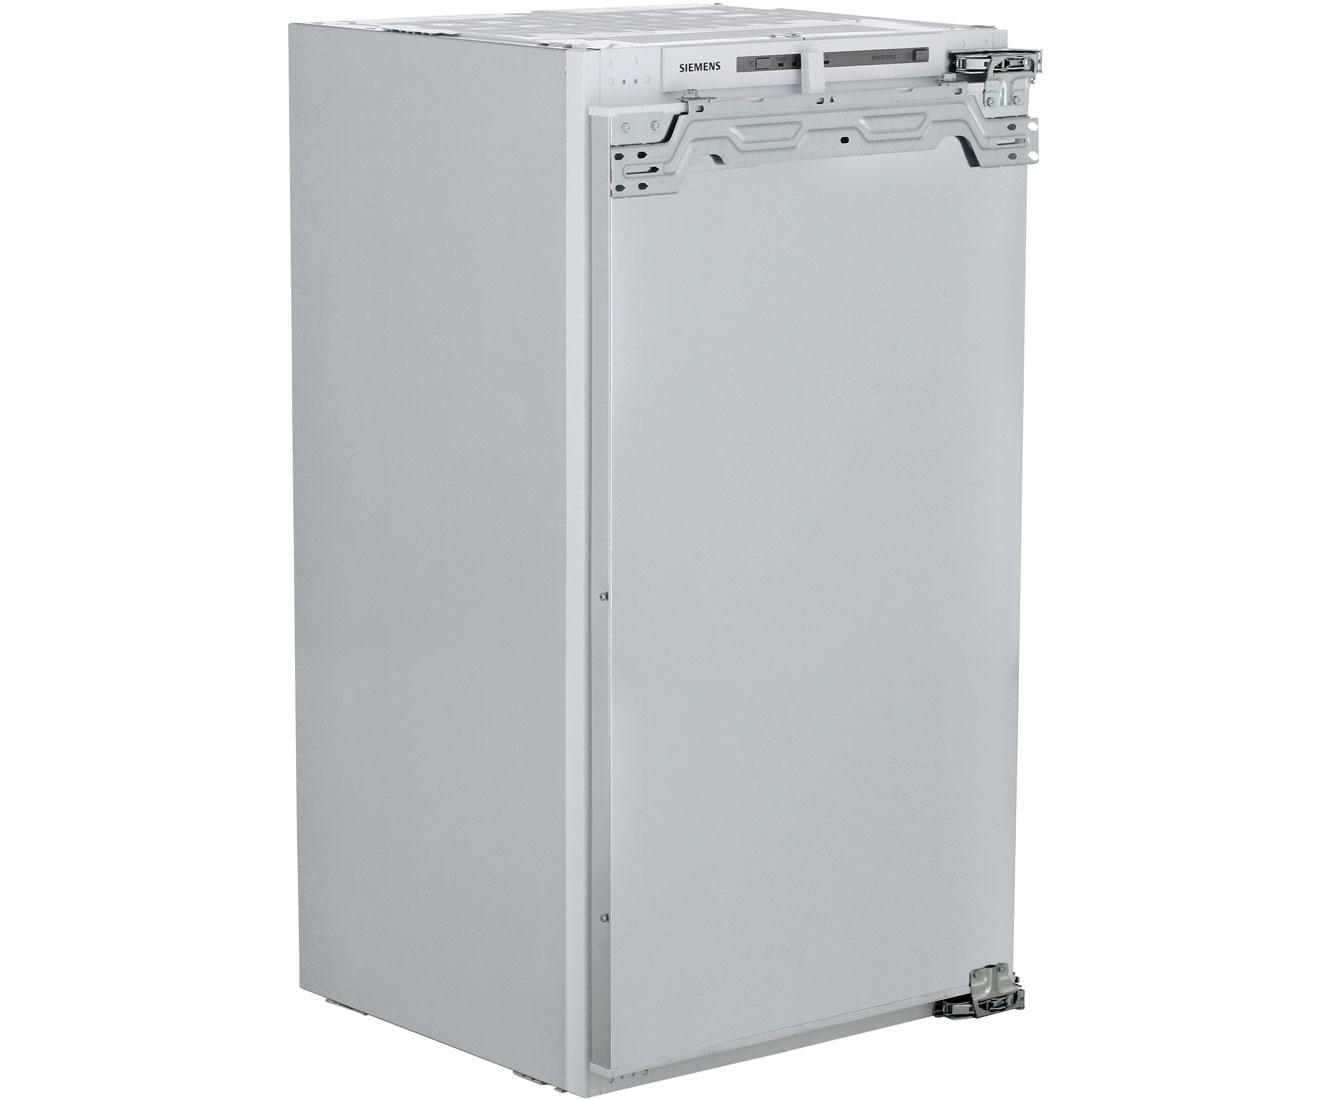 Bomann Kühlschrank Stinkt : Bomann kühlschrank stinkt bomann kg kühl gefrierkombination